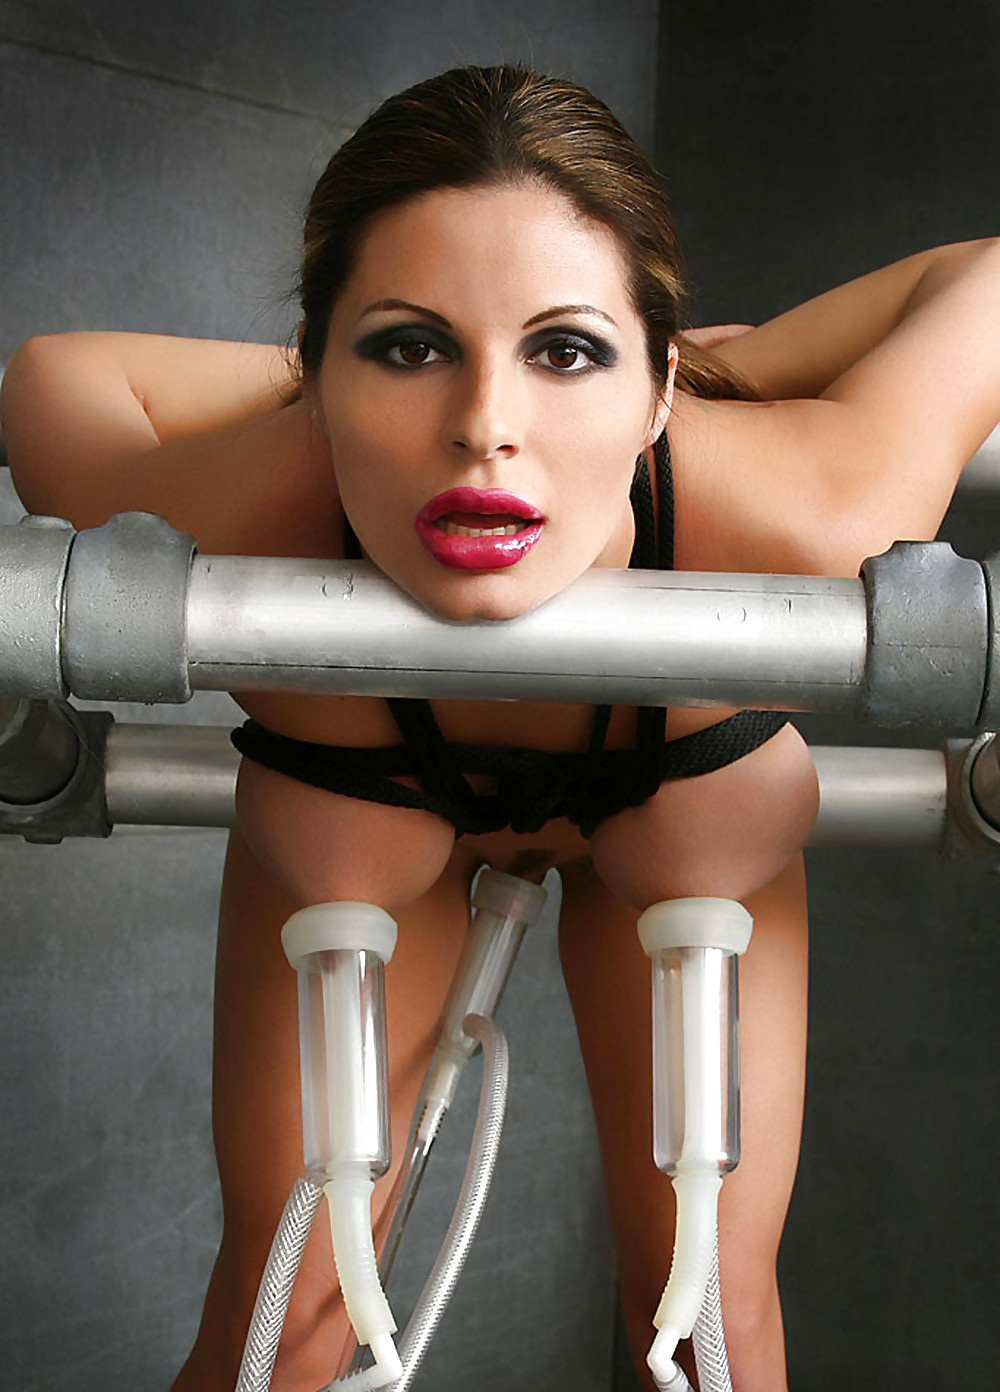 Tit milking stretching machine